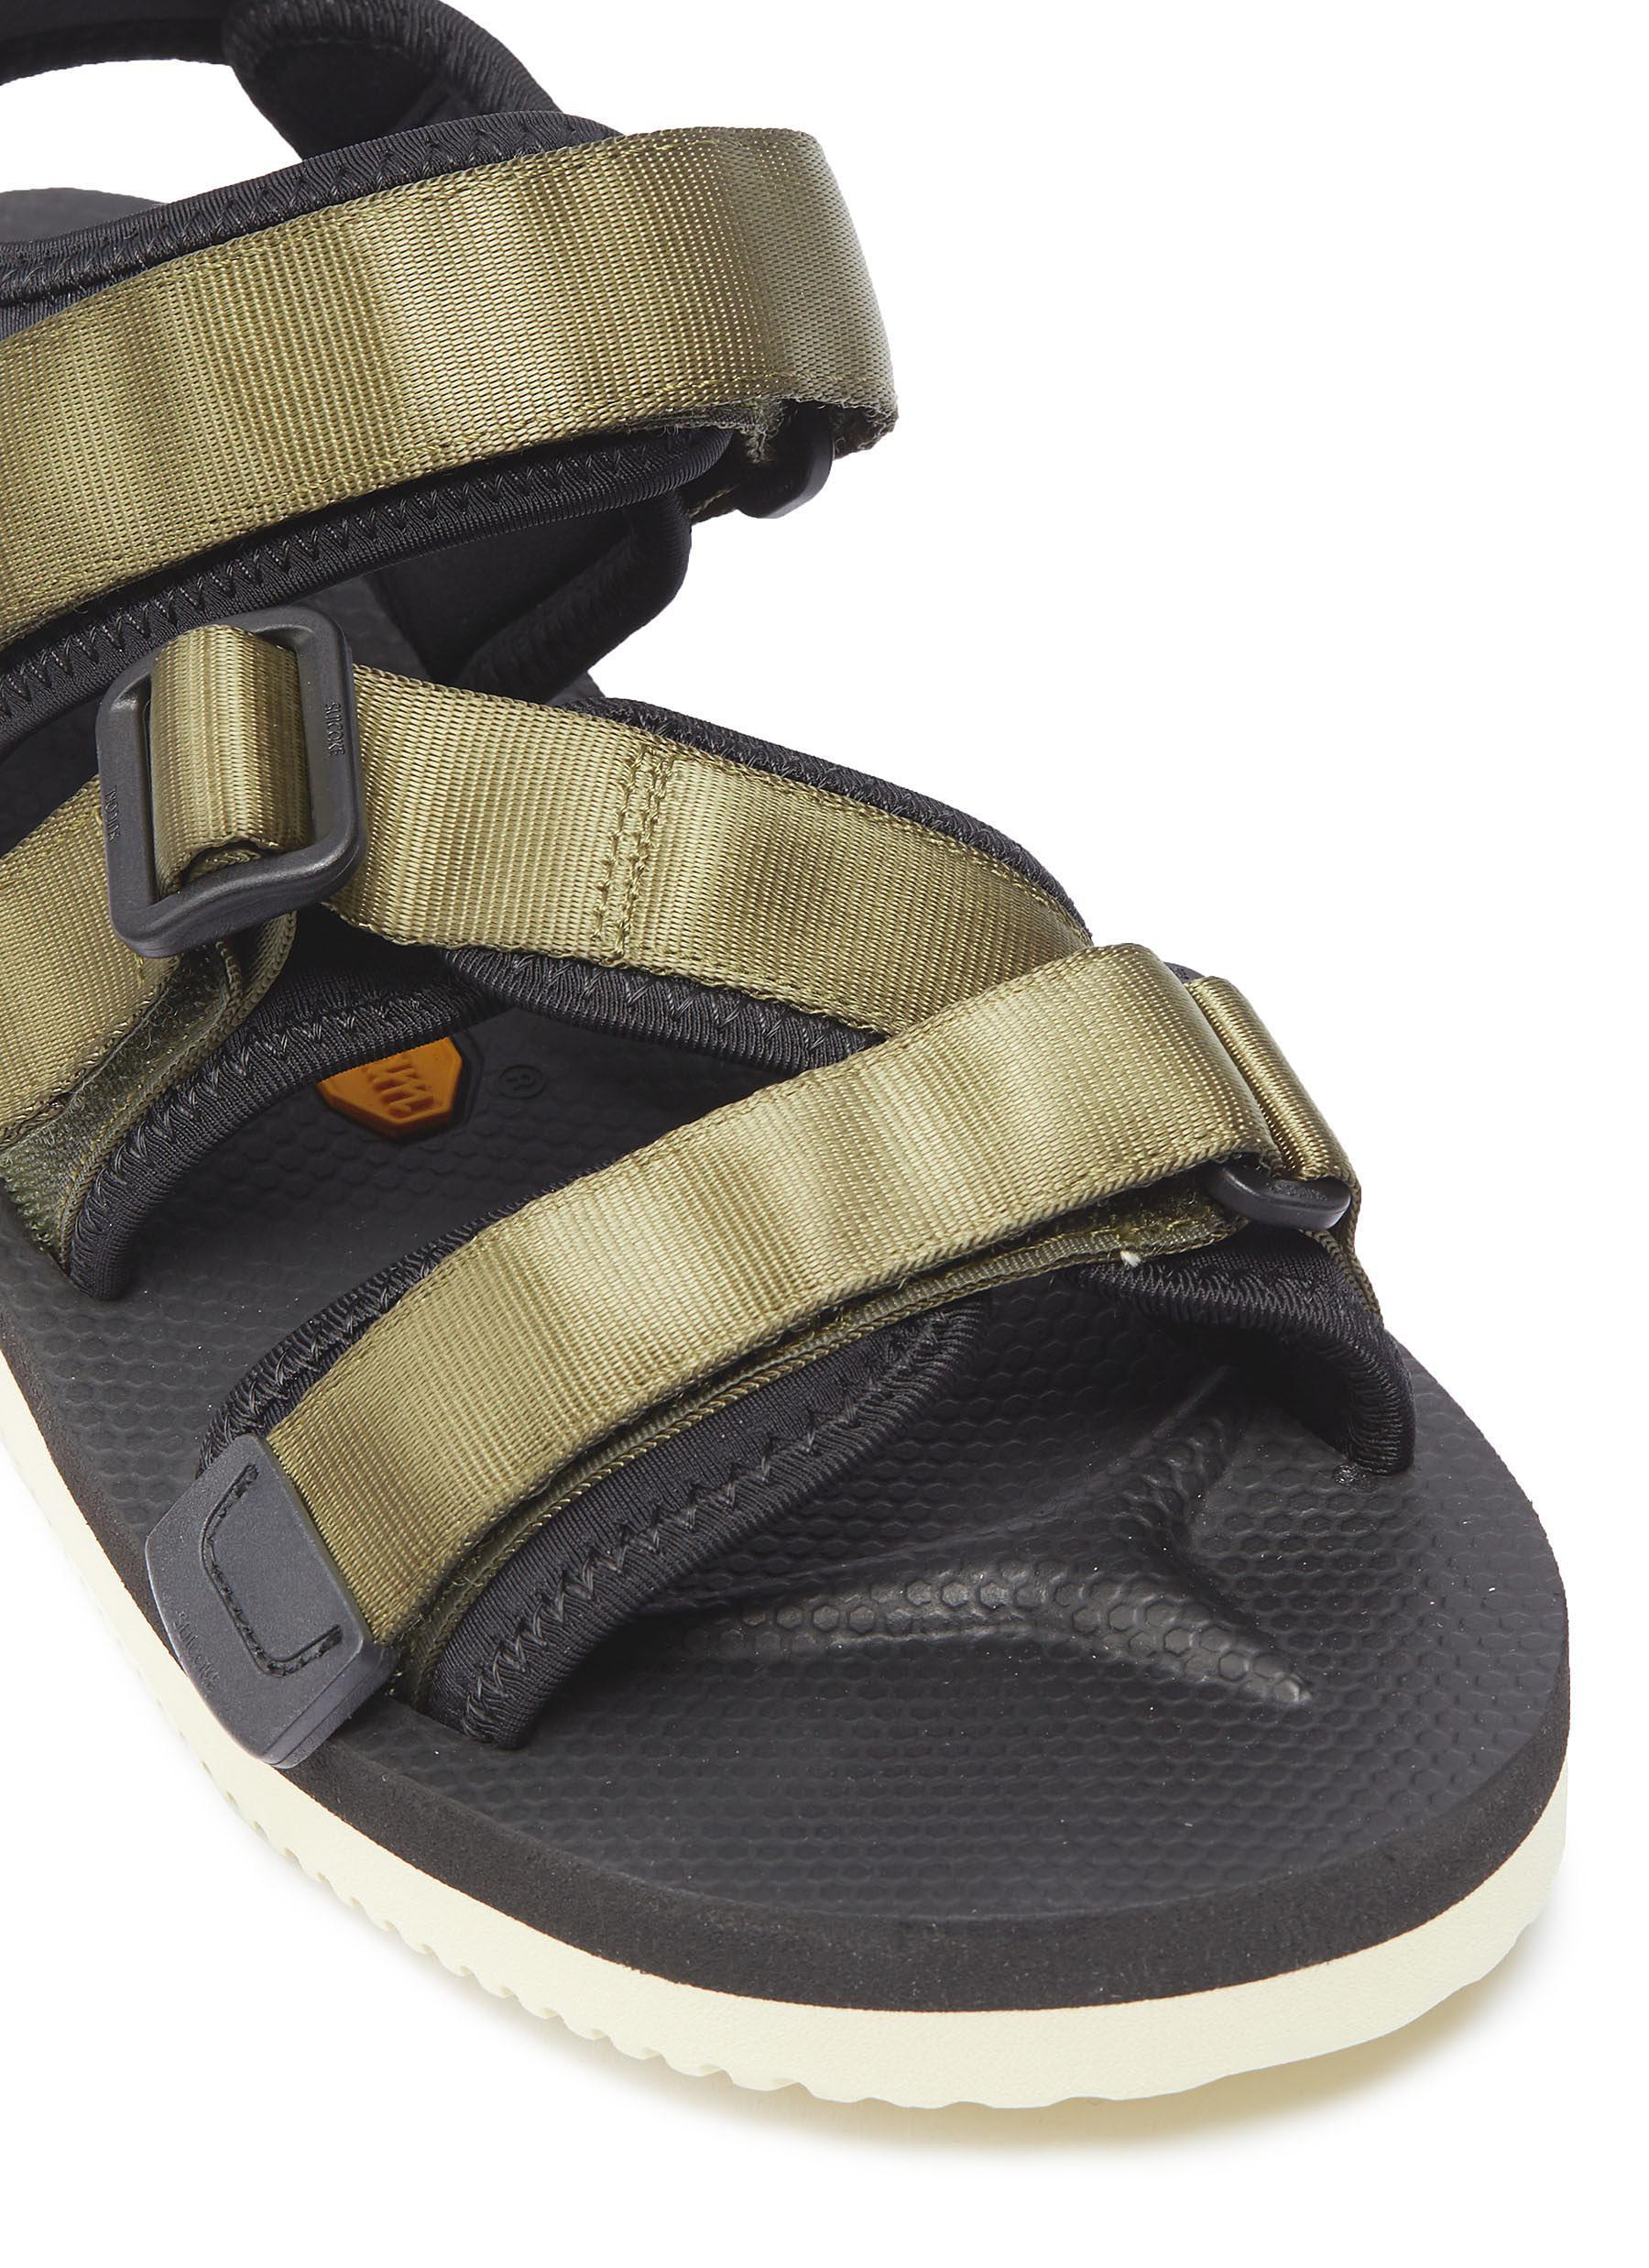 07e1d27e7f24 Suicoke - Green  kisee-v  Strappy Sandals - Lyst. View fullscreen